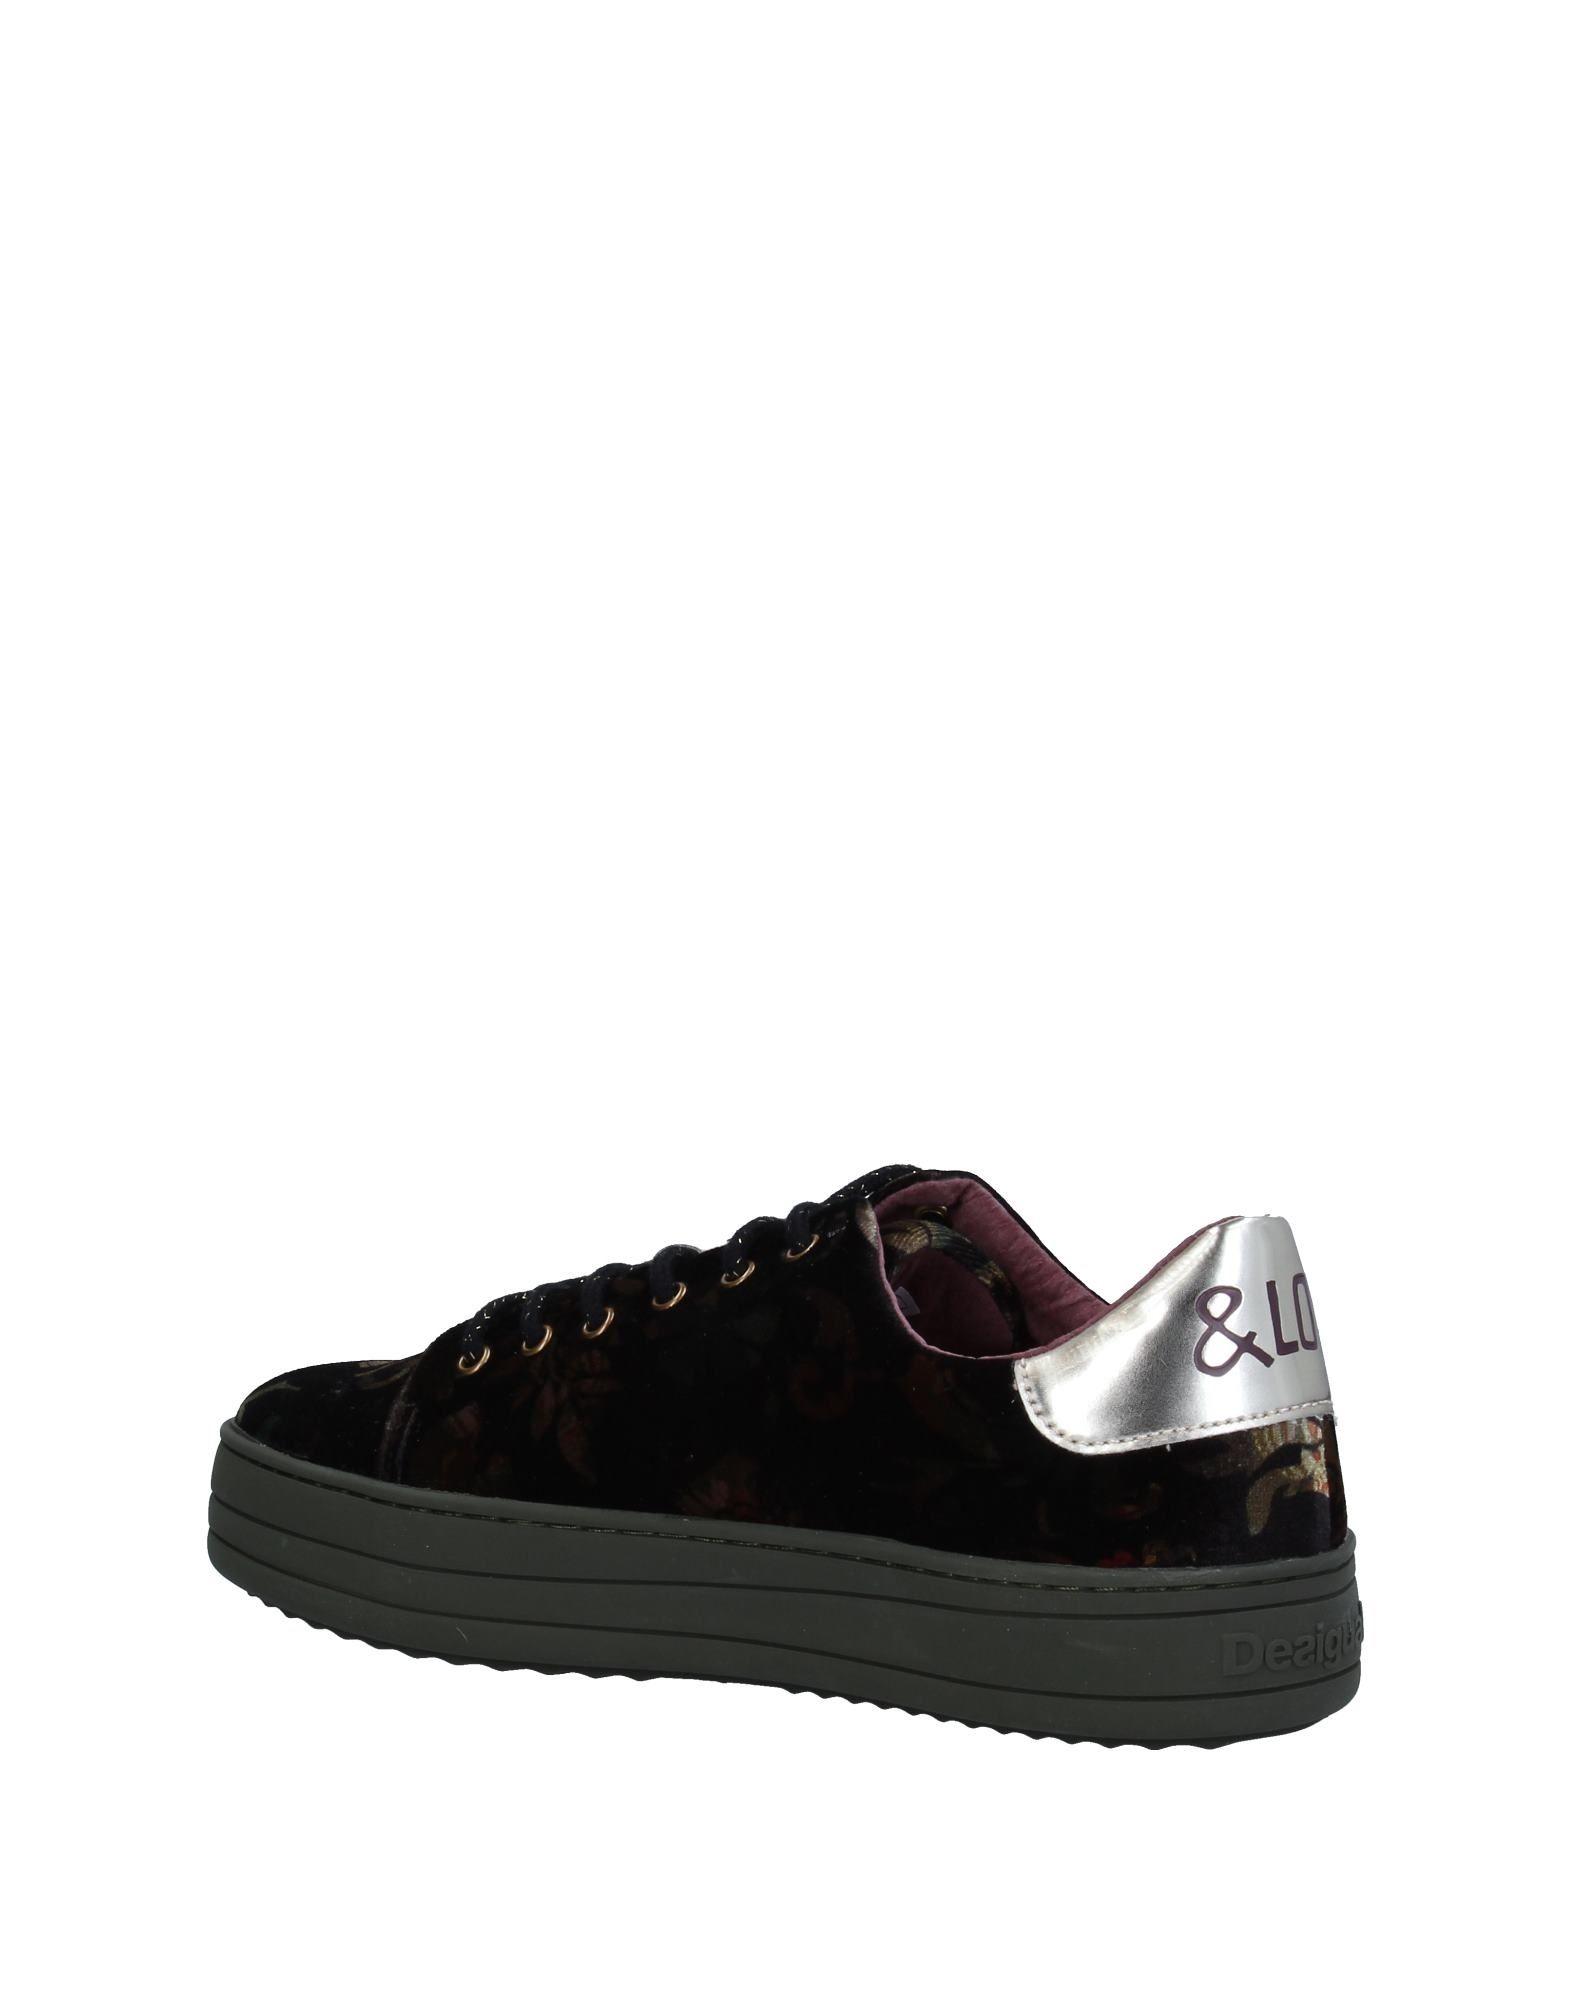 Desigual Sneakers Damen Damen Damen  11338161XJ Heiße Schuhe 068396